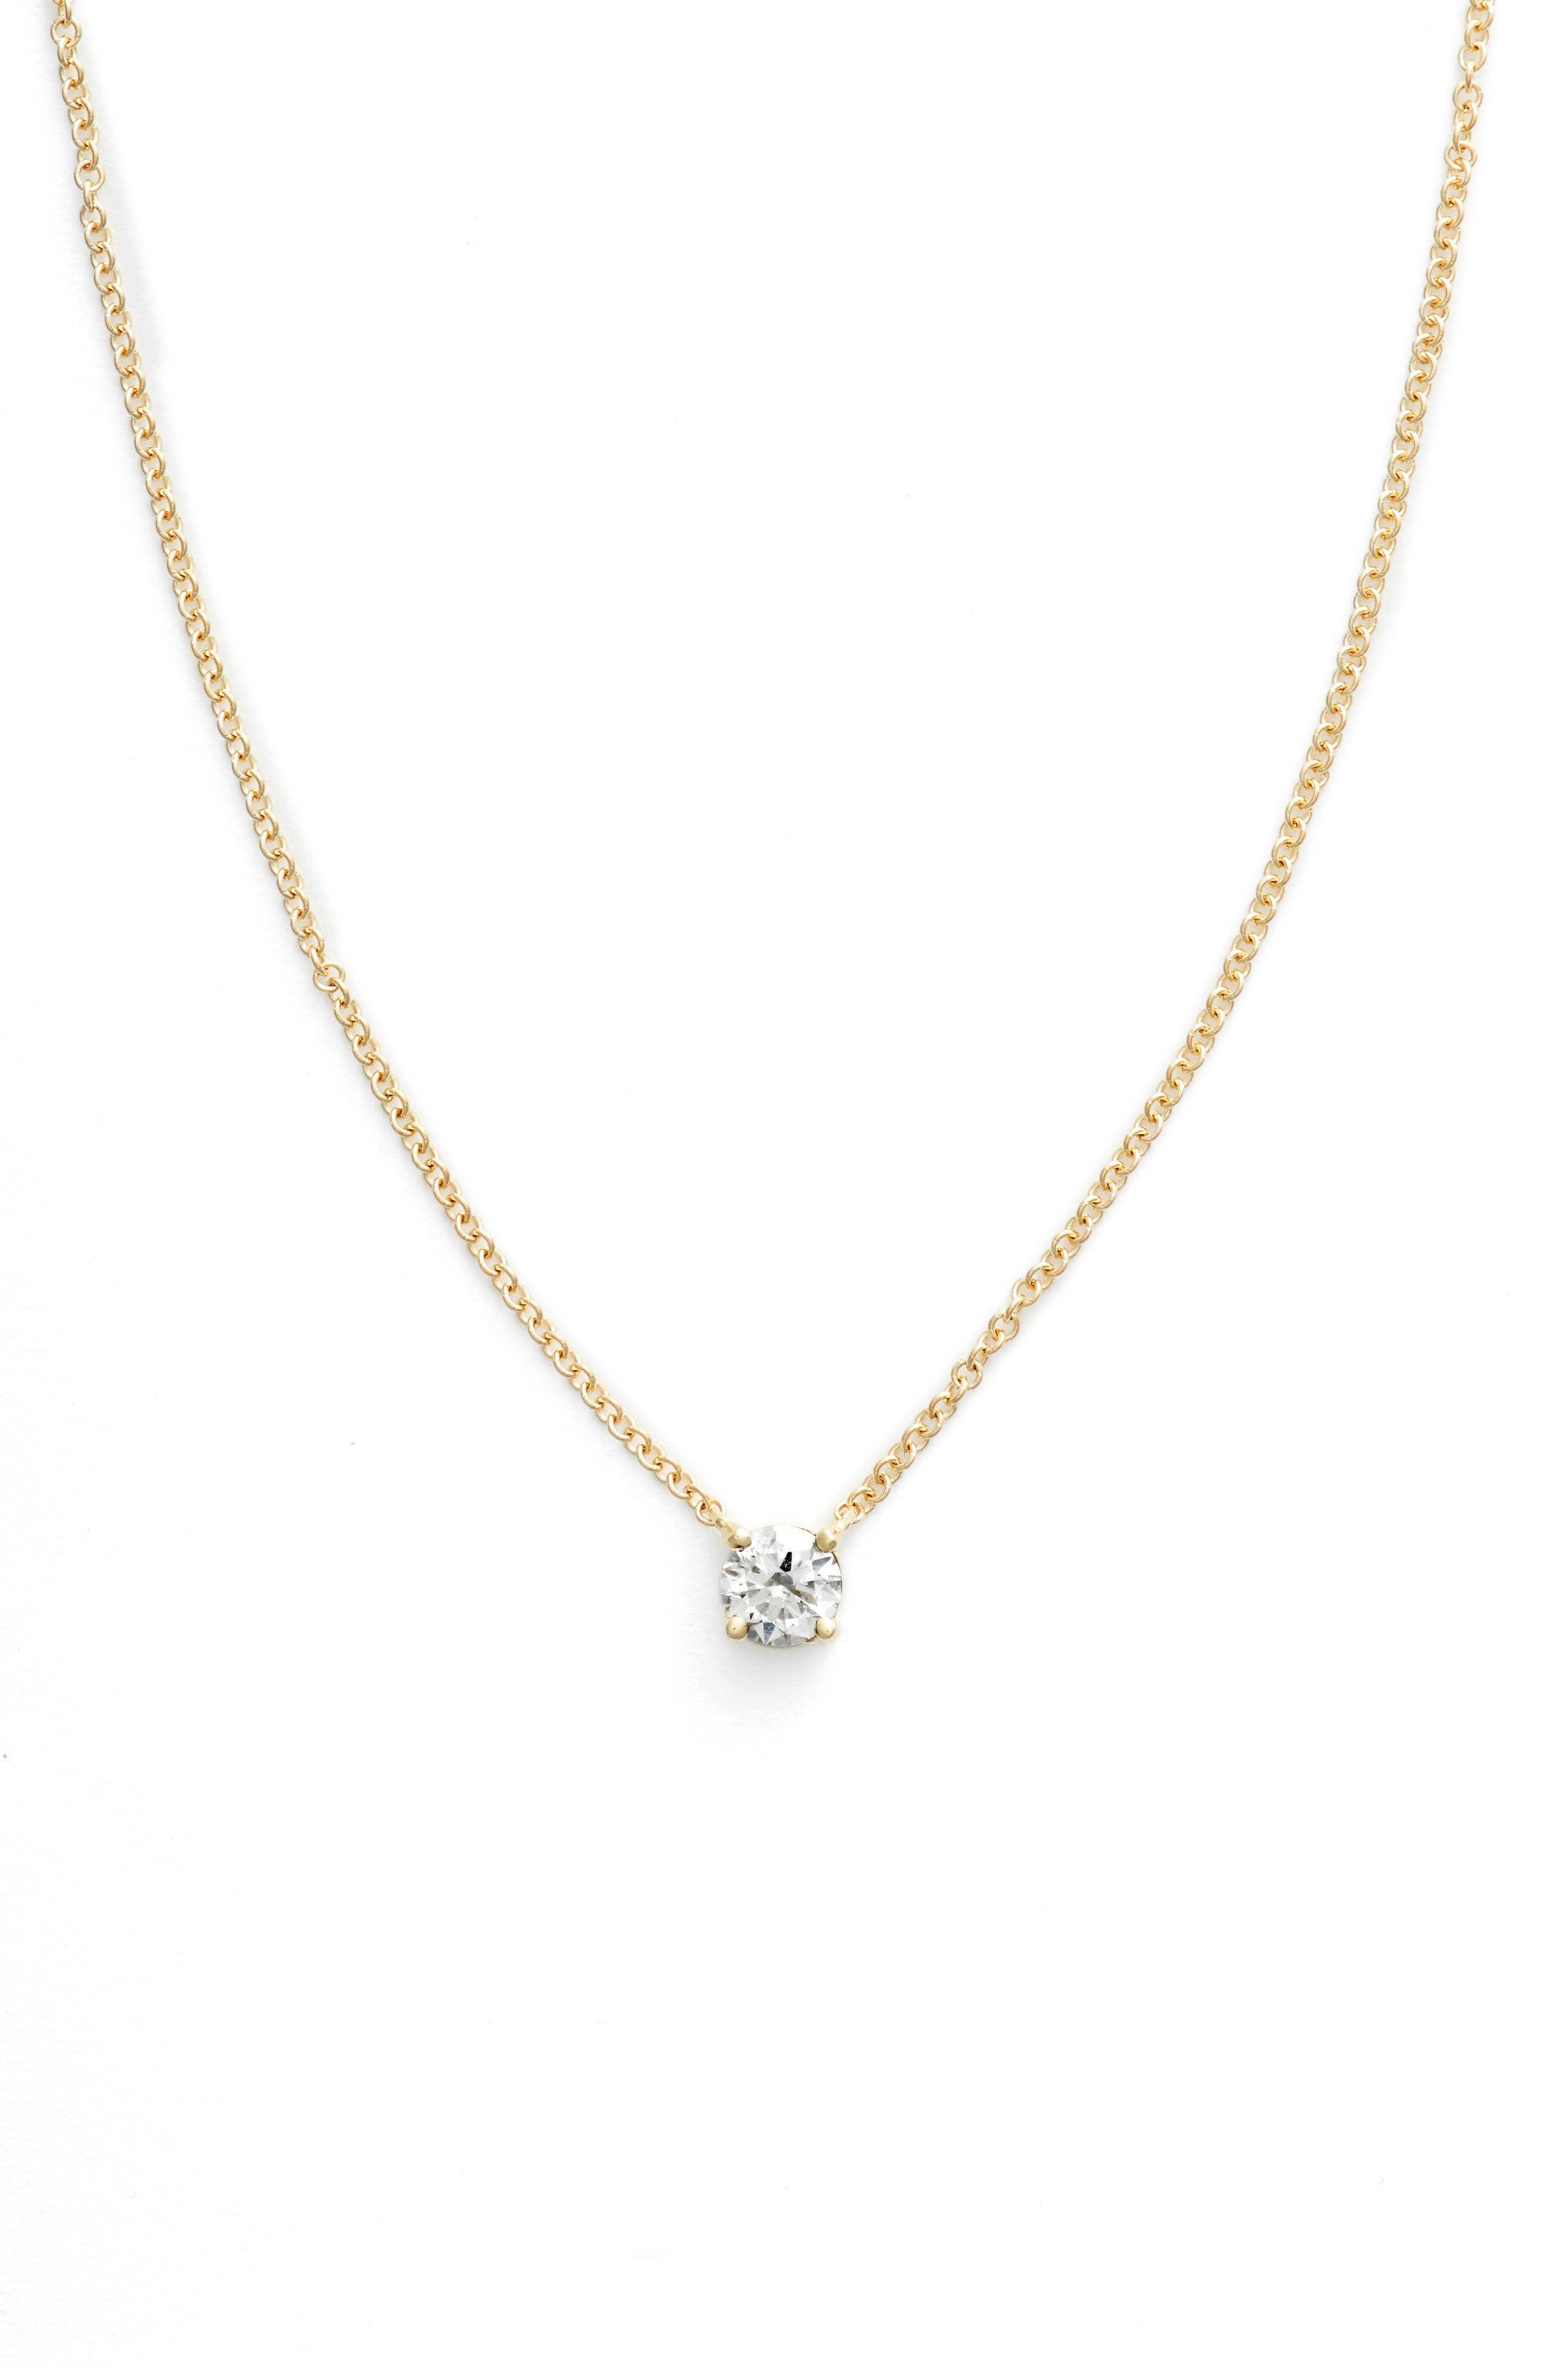 BONY LEVY Liora Solitaire Diamond Pendant Necklace, Main, color, YELLOW GOLD